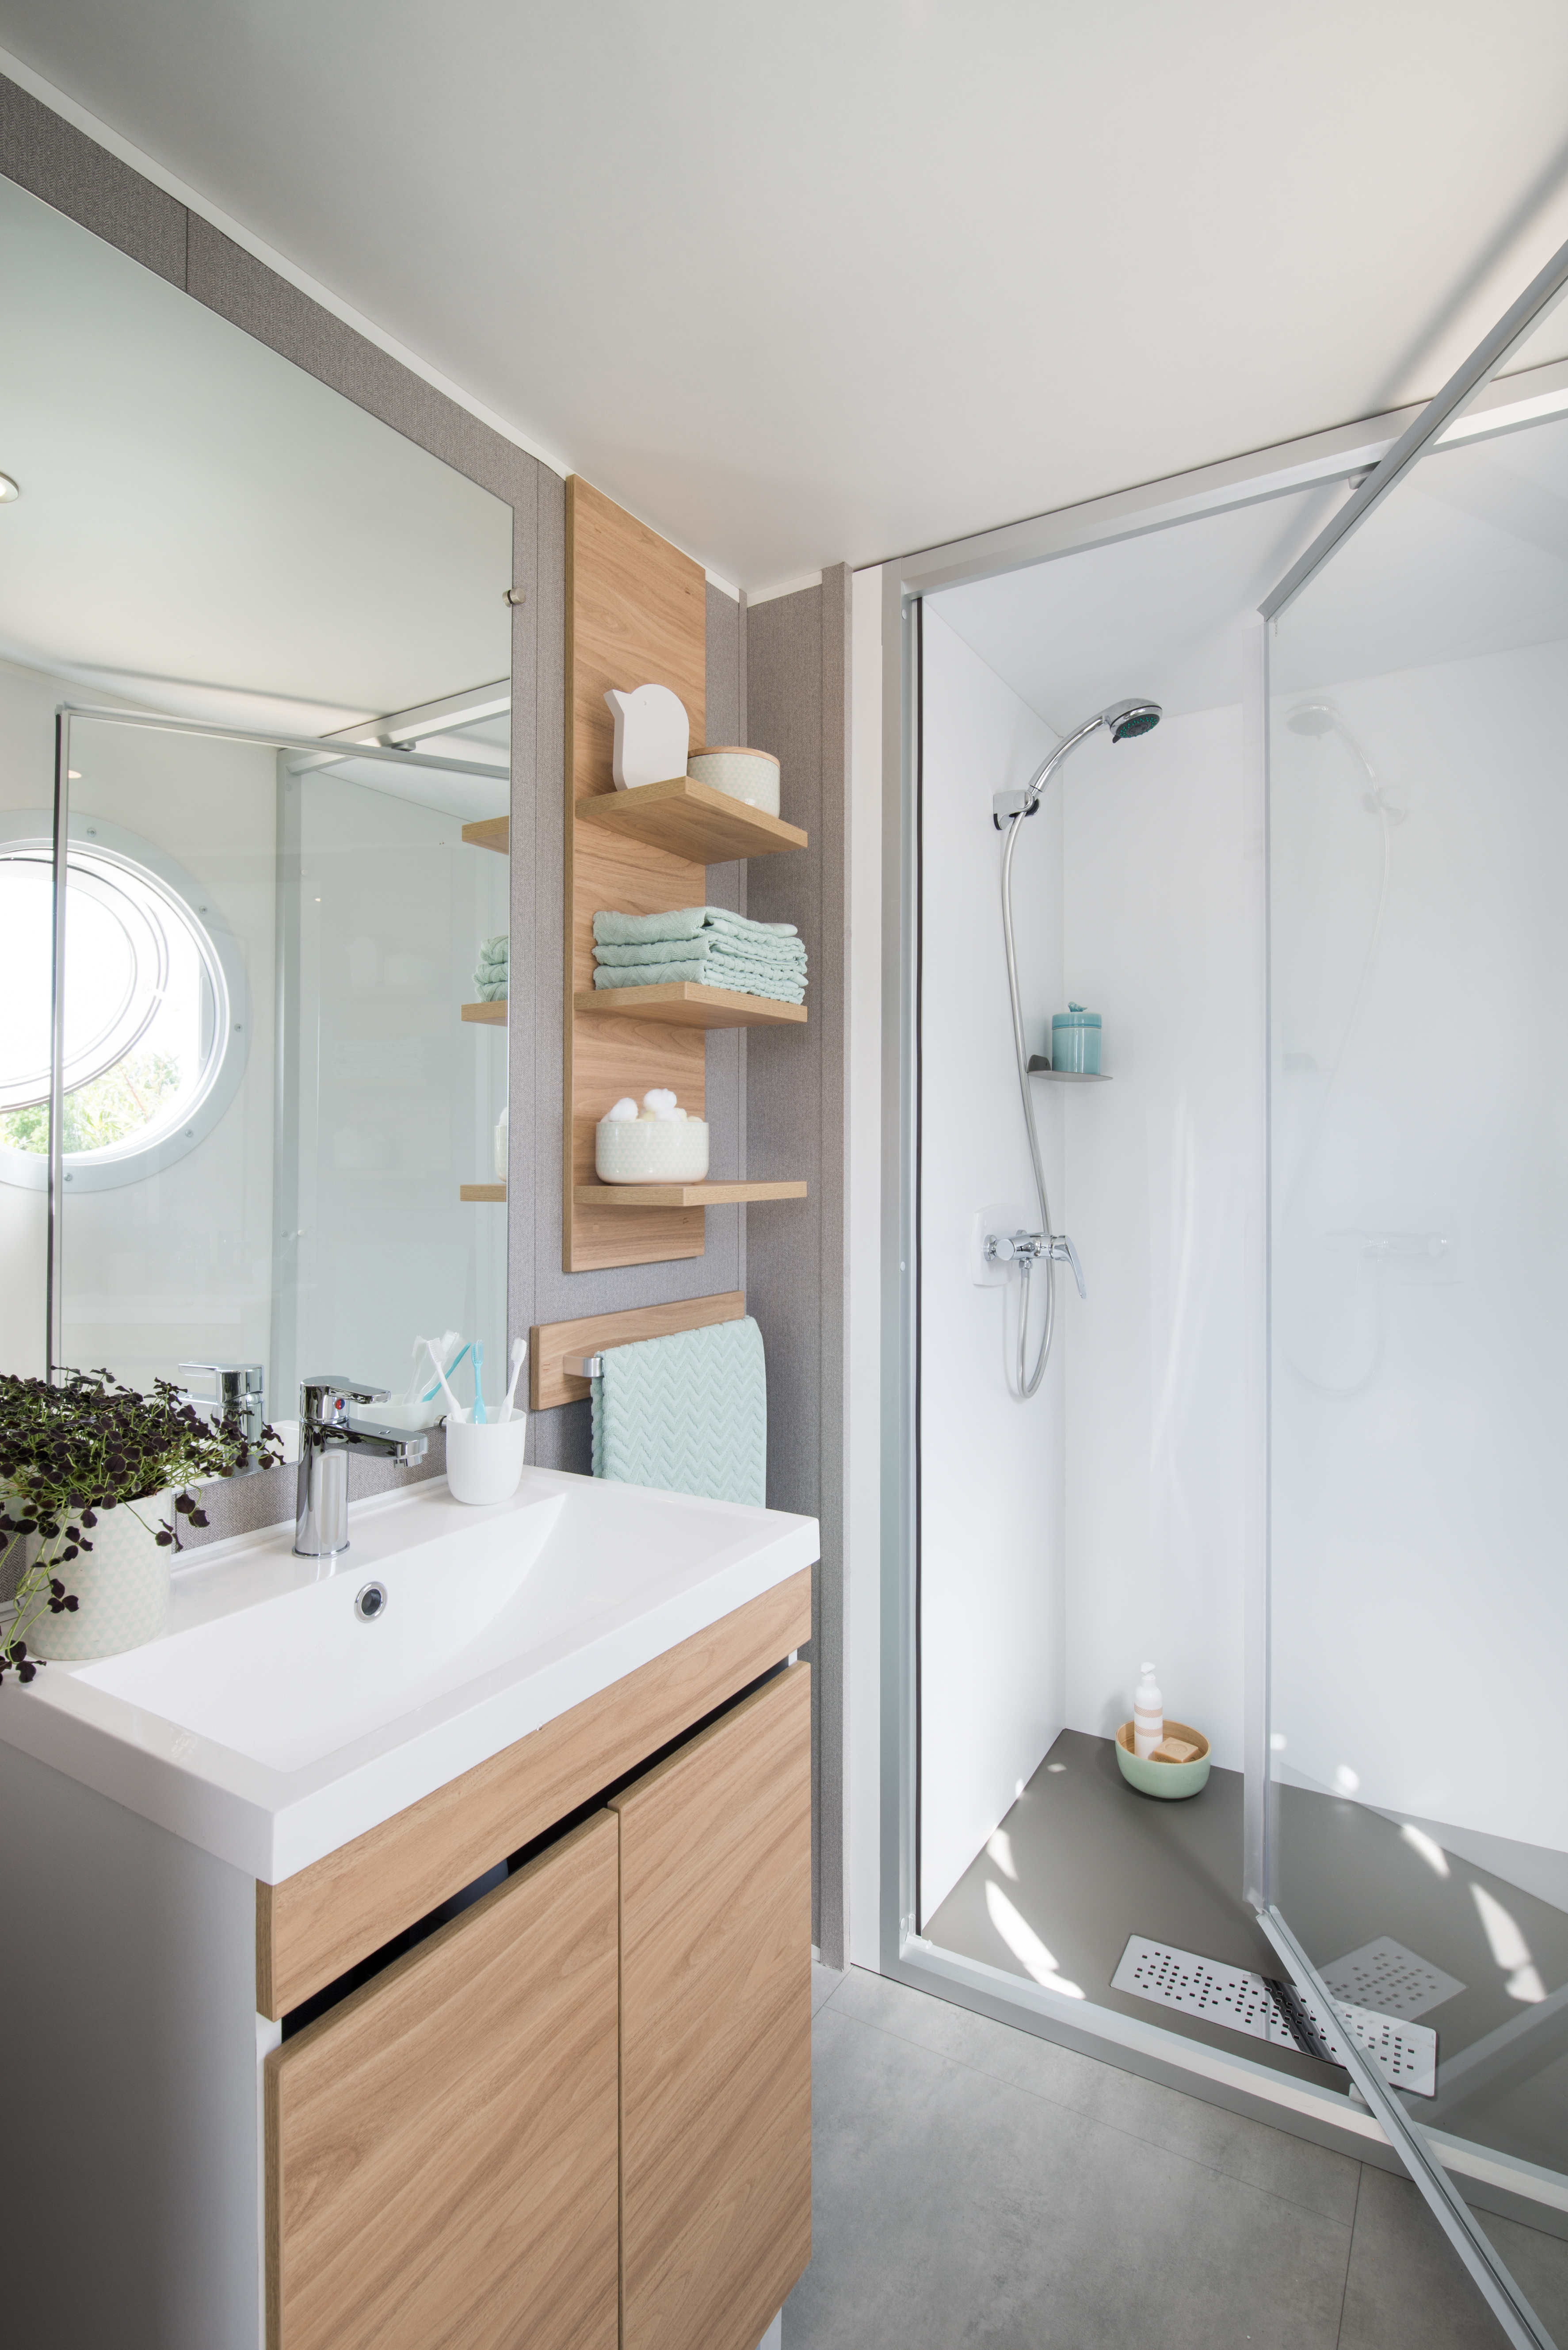 Mobil-home Famille 3 chambres - Salle de bain